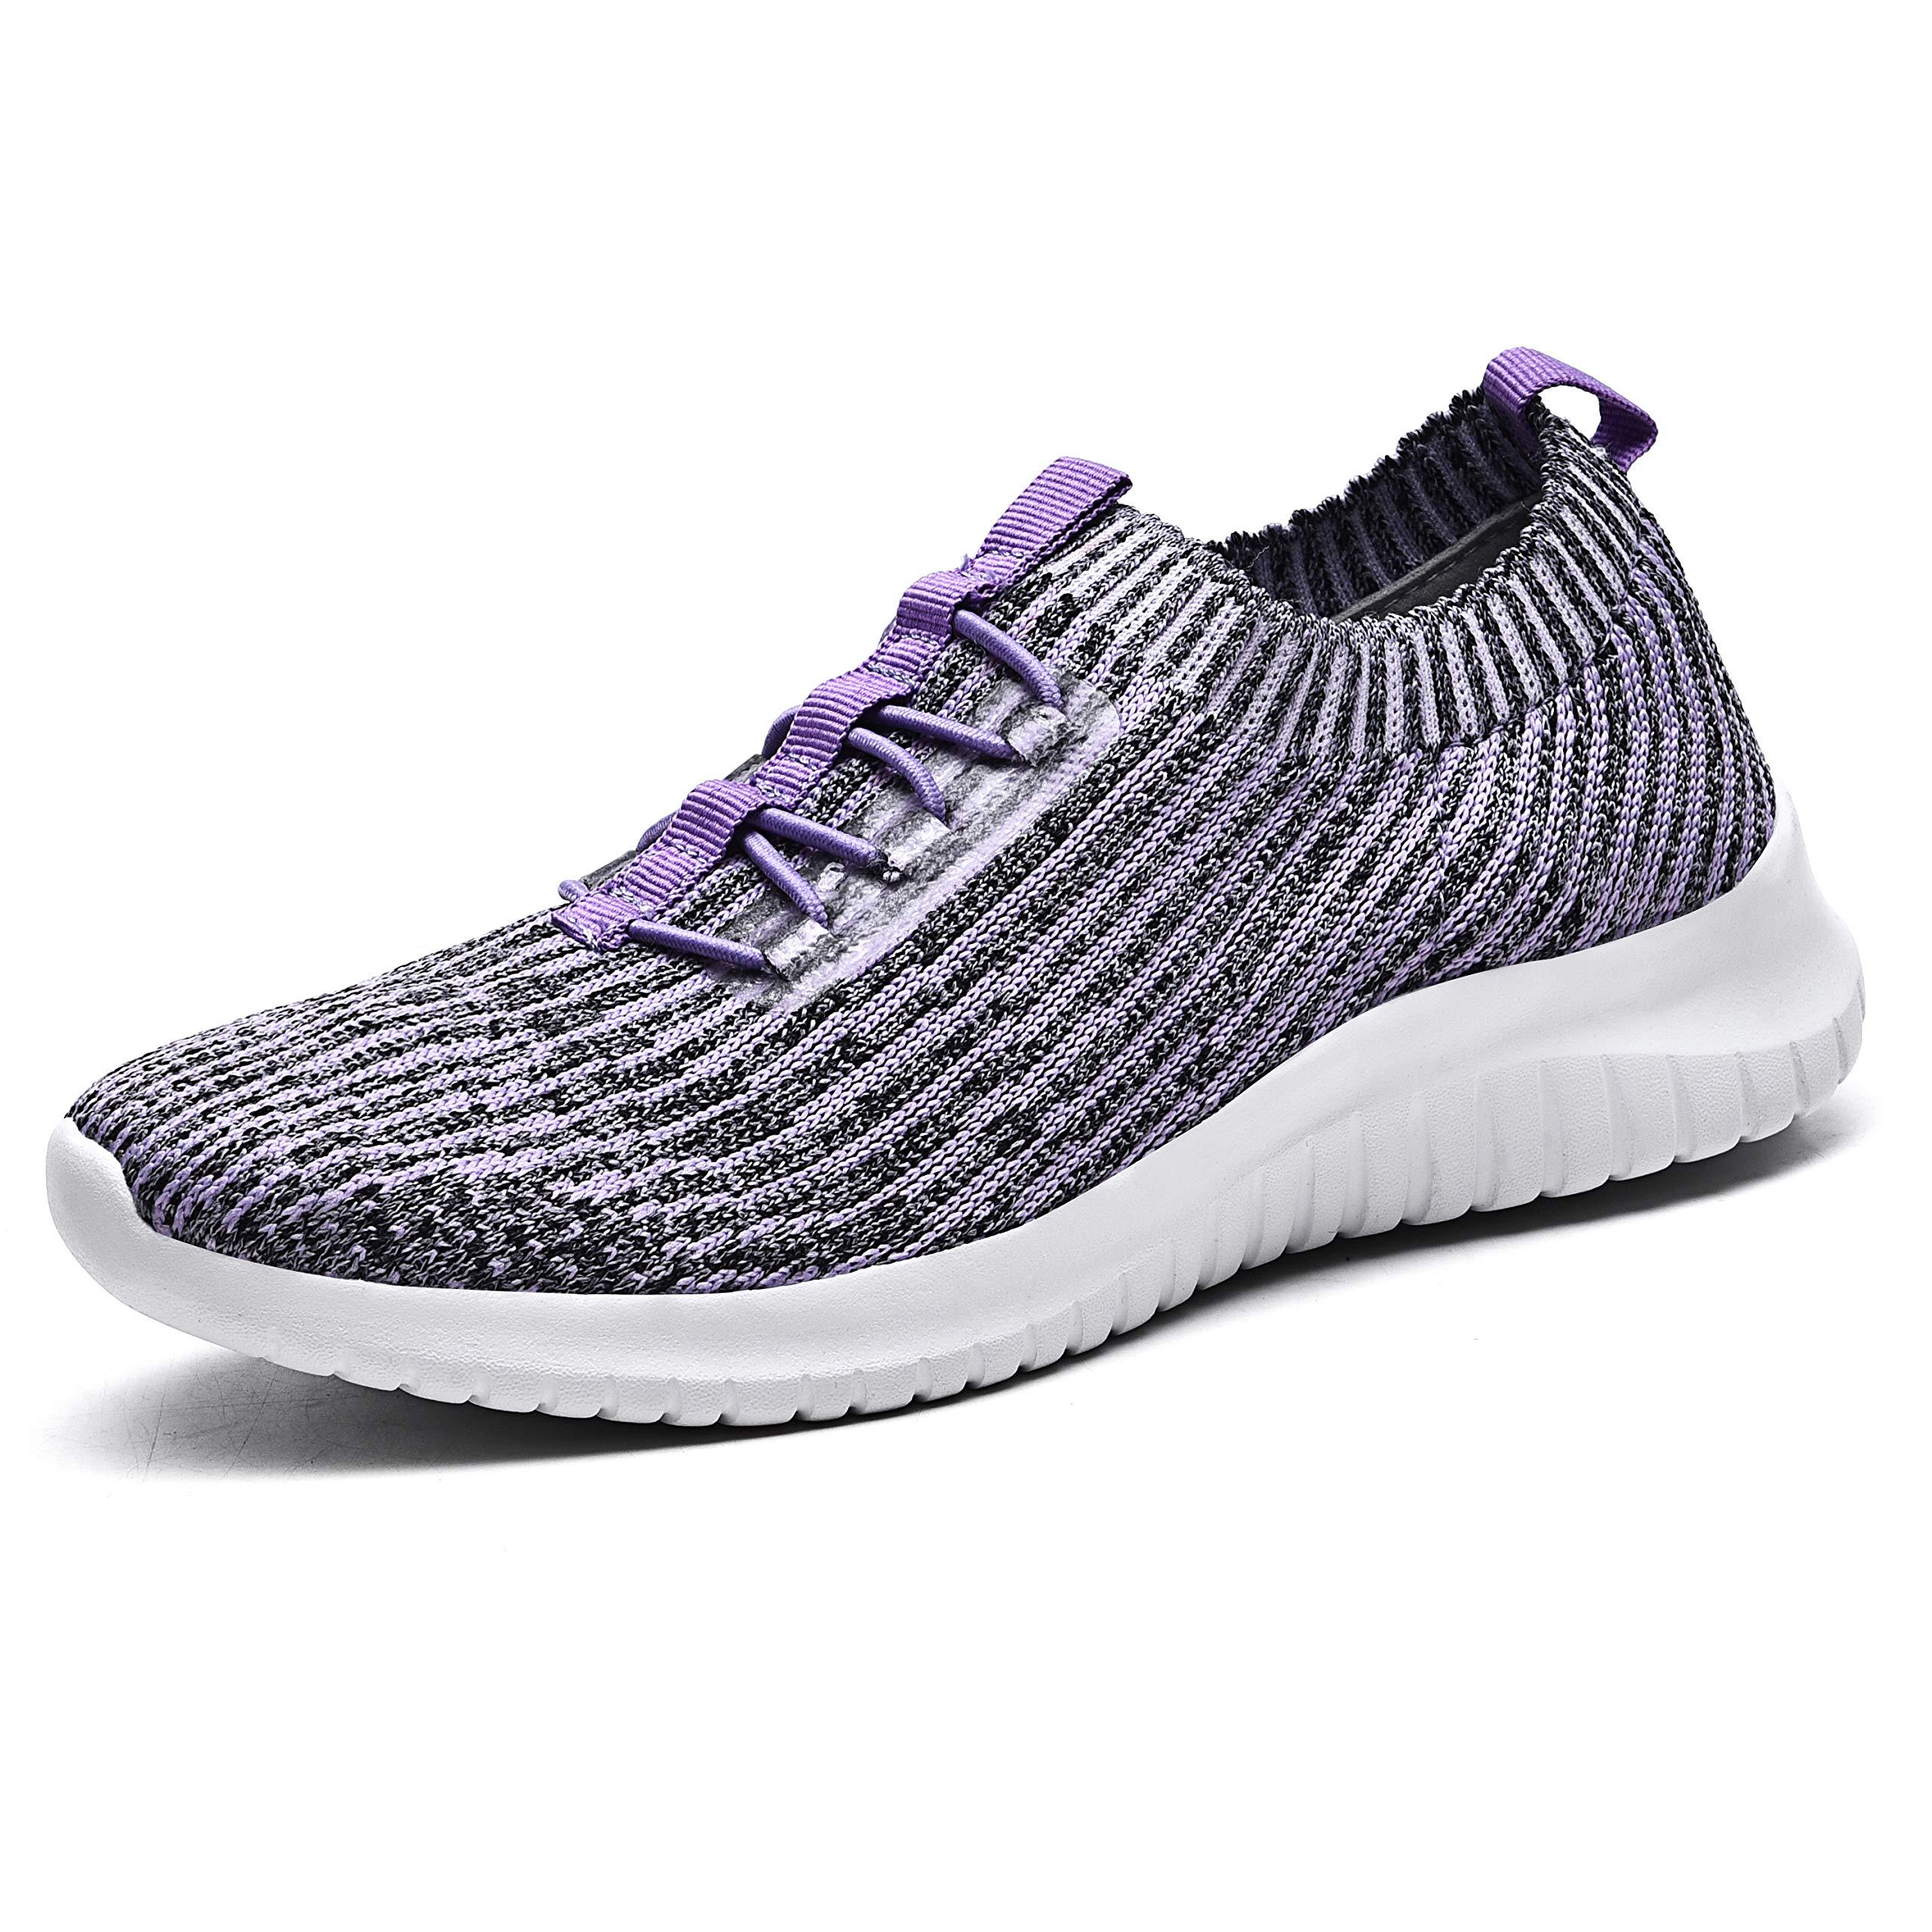 TIOSEBON Women's Athletic Walking Shoes Comfortable Slip-On Running Sneakers 10 US Light Purple